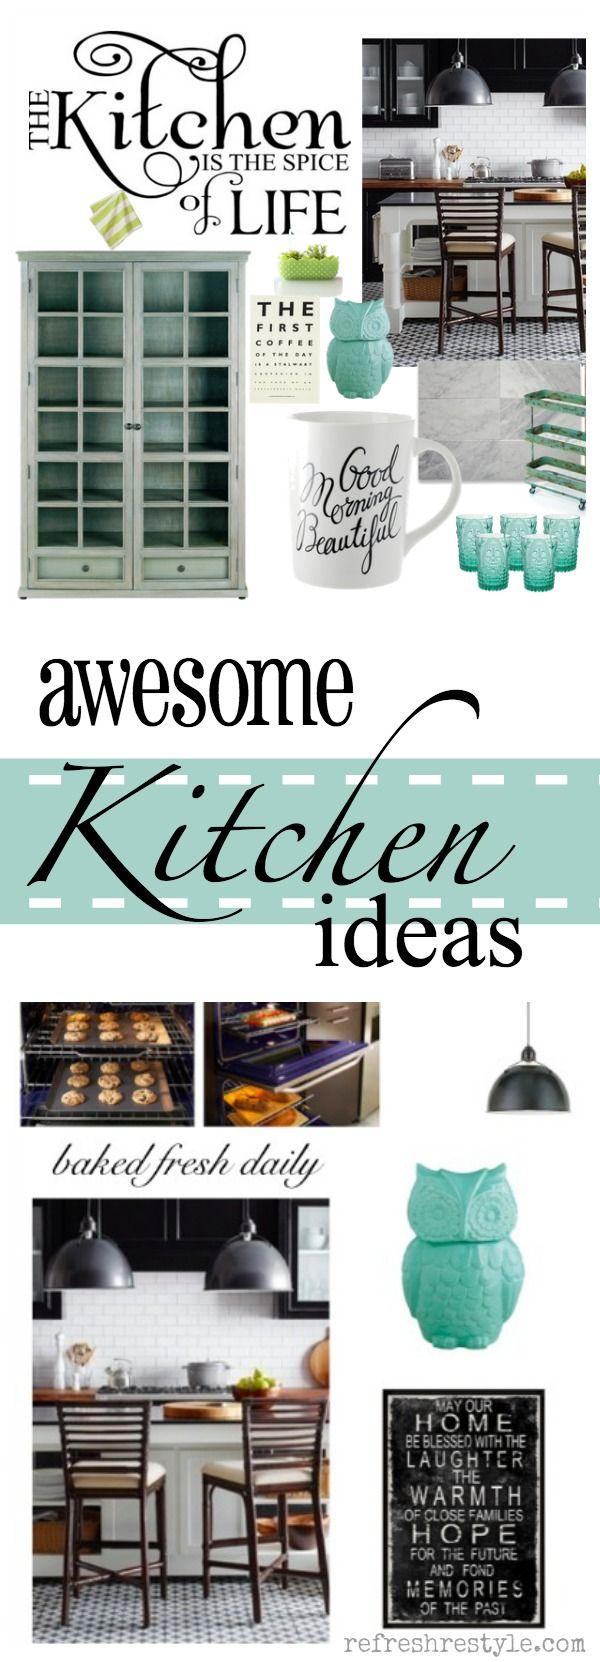 284 best Kitchen images on Pinterest | Kitchen ideas, Wall flowers ...